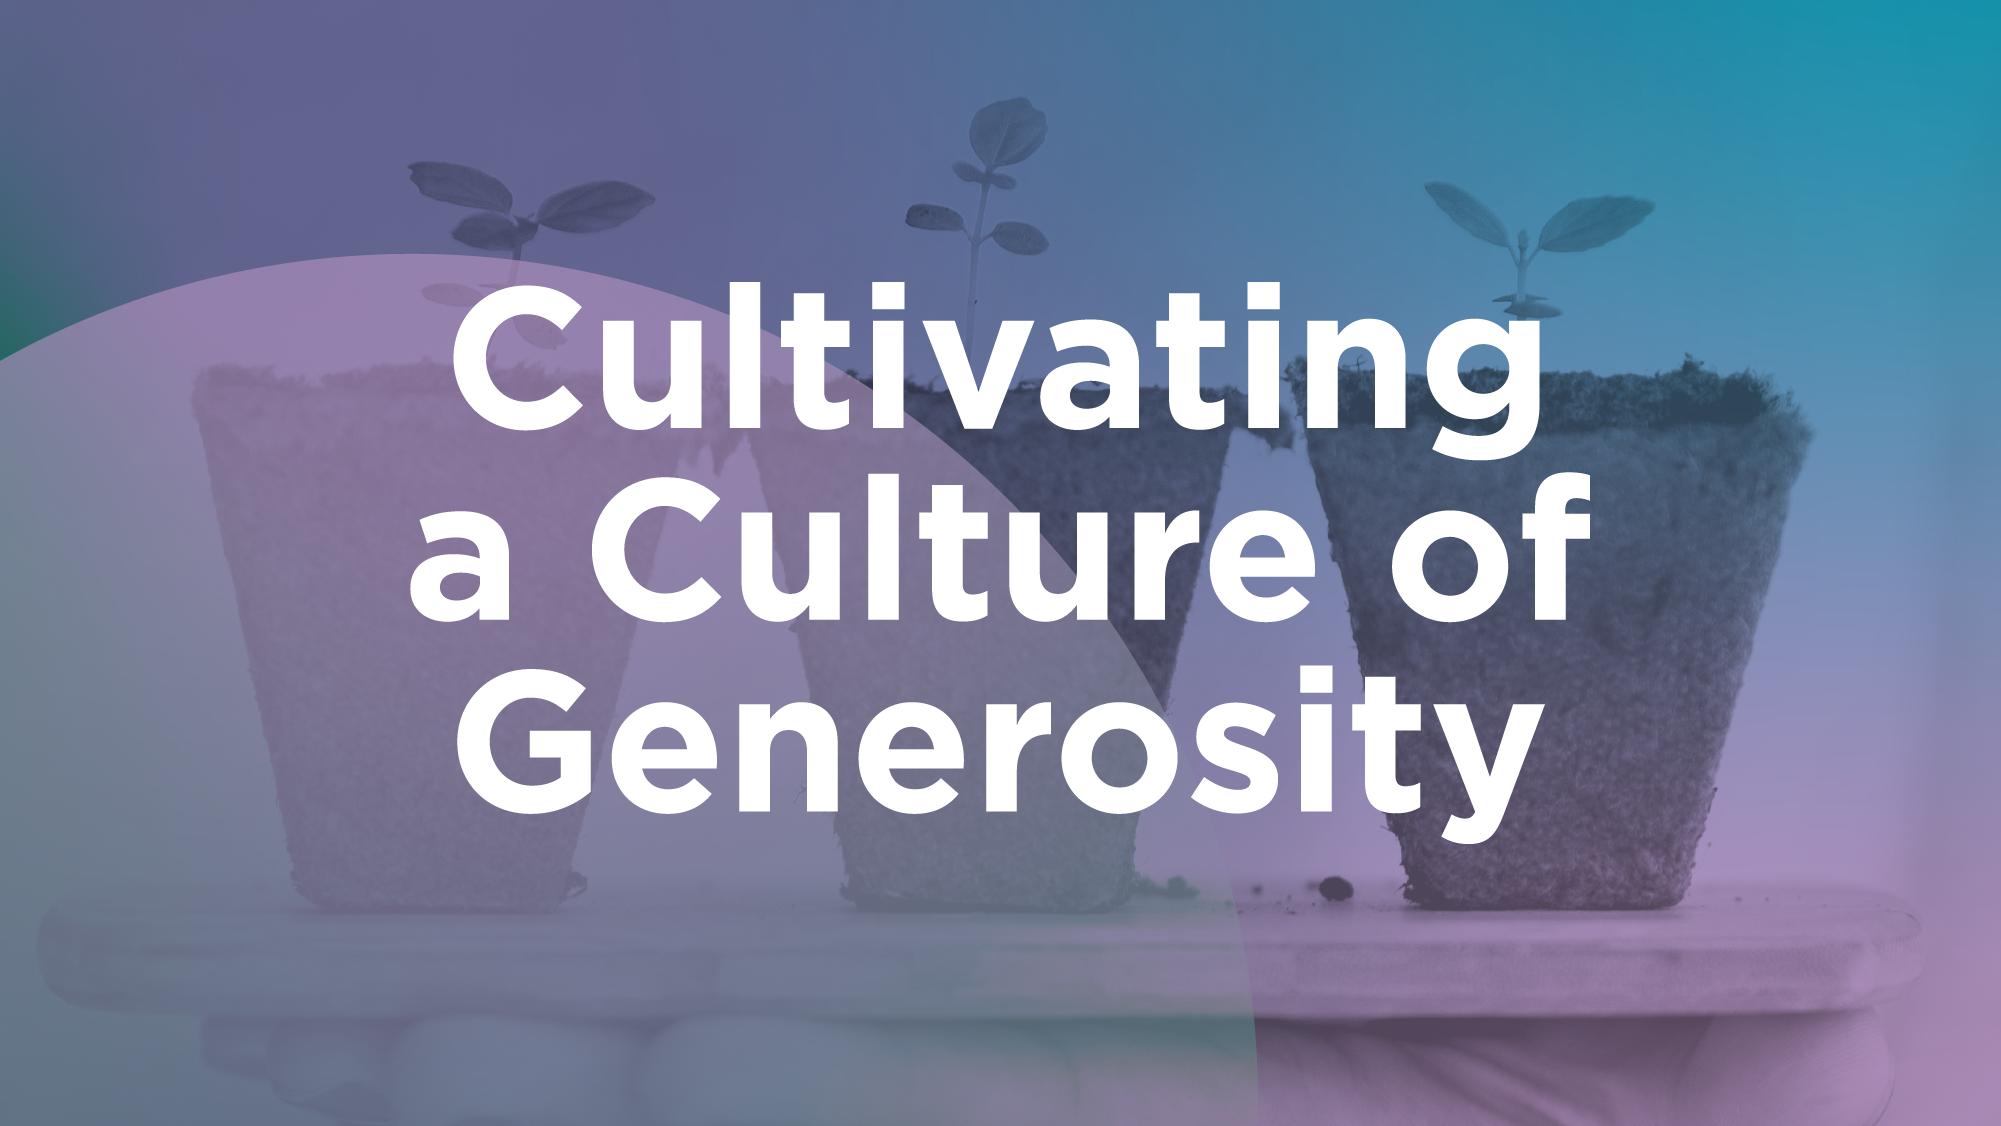 Cultivating a Culture of Generosity